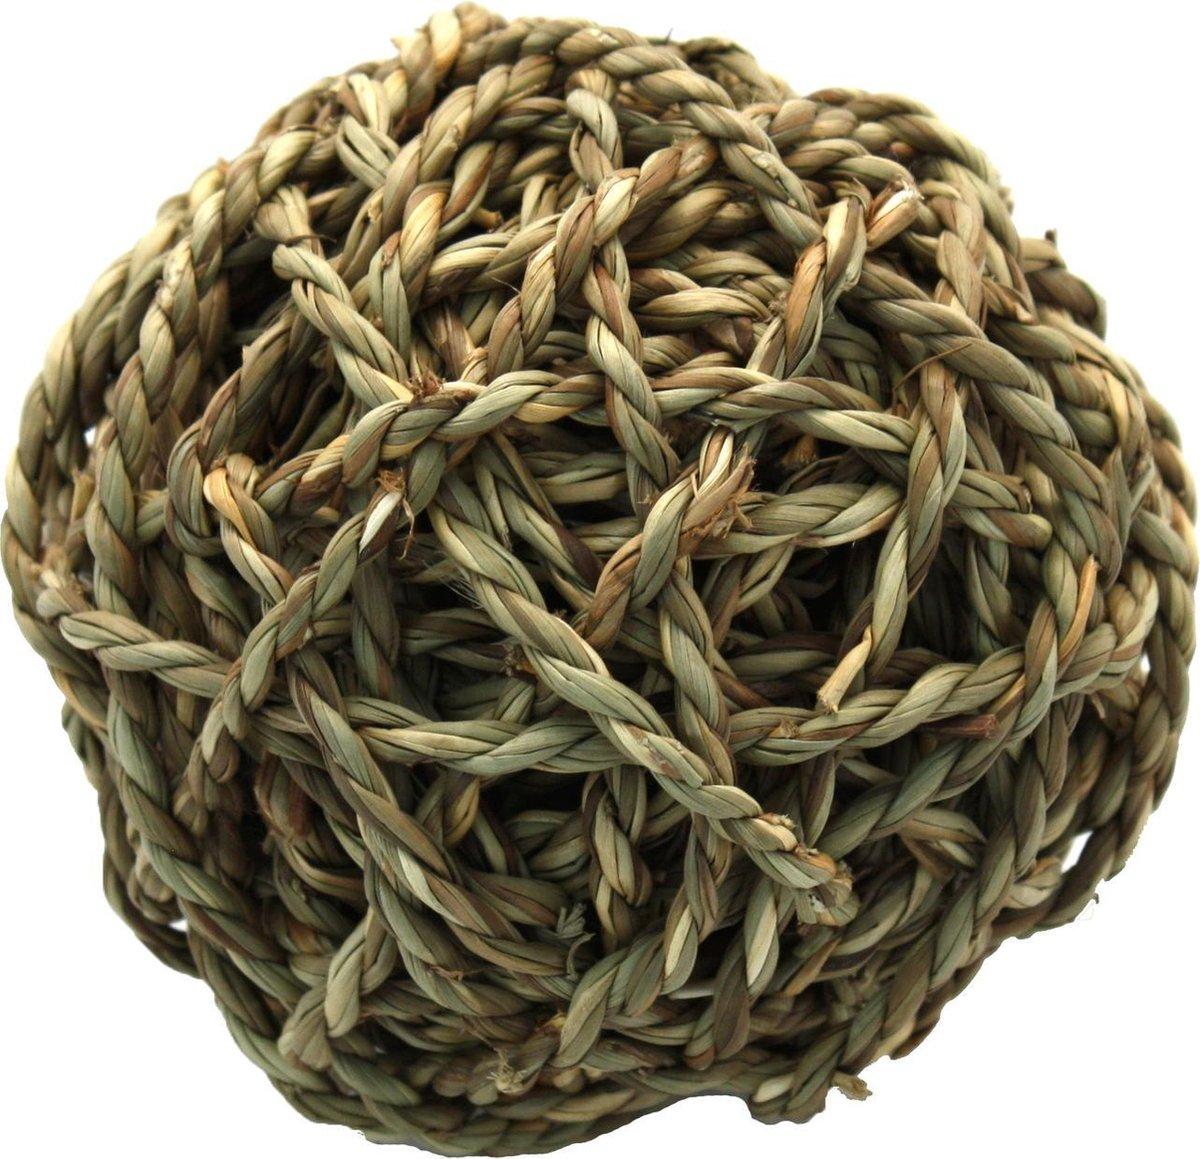 Happy Pet Grassy Ball - Knaagbal - 11 x 11 x 11 cm - Happy Pet